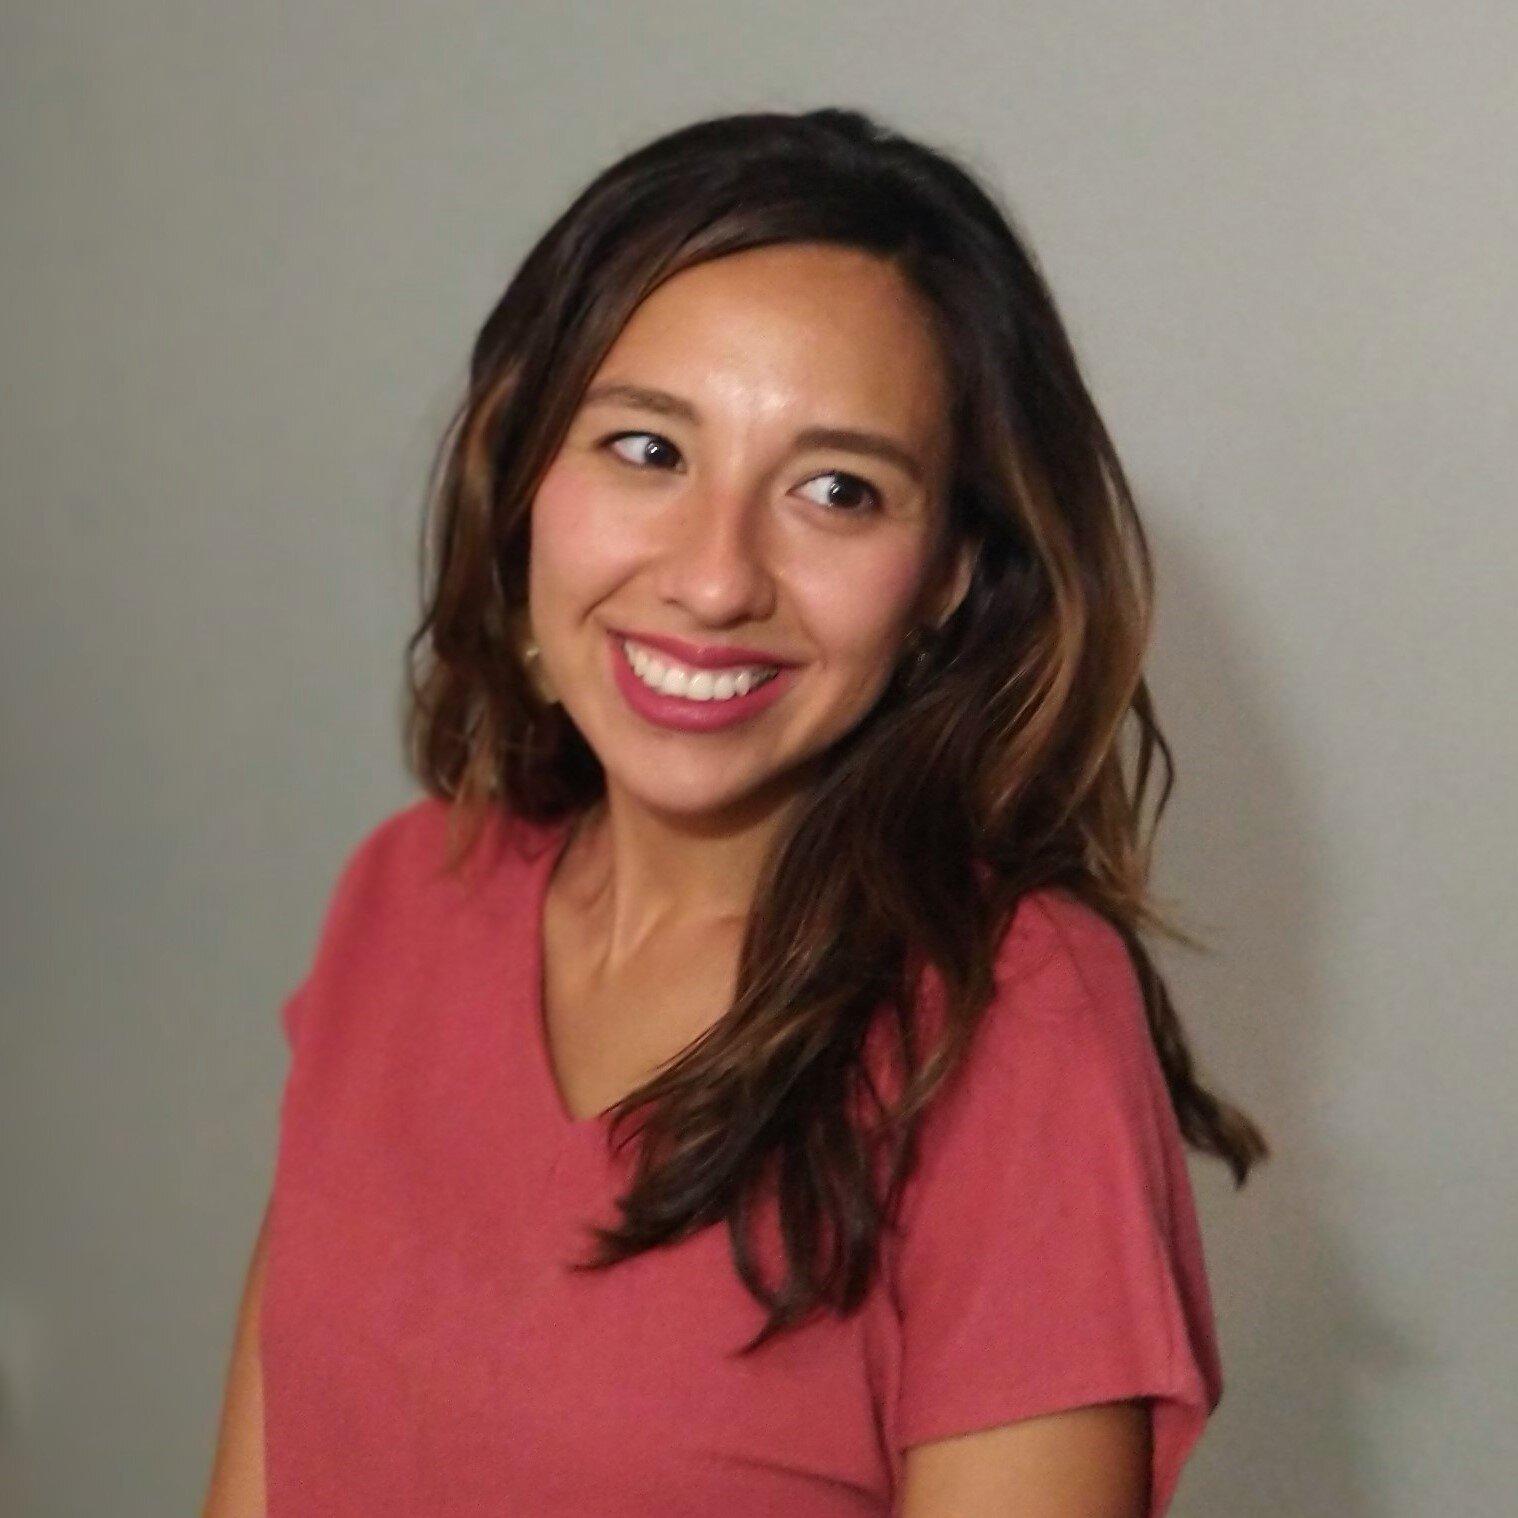 Andreina Centlivre - Communications Consultant